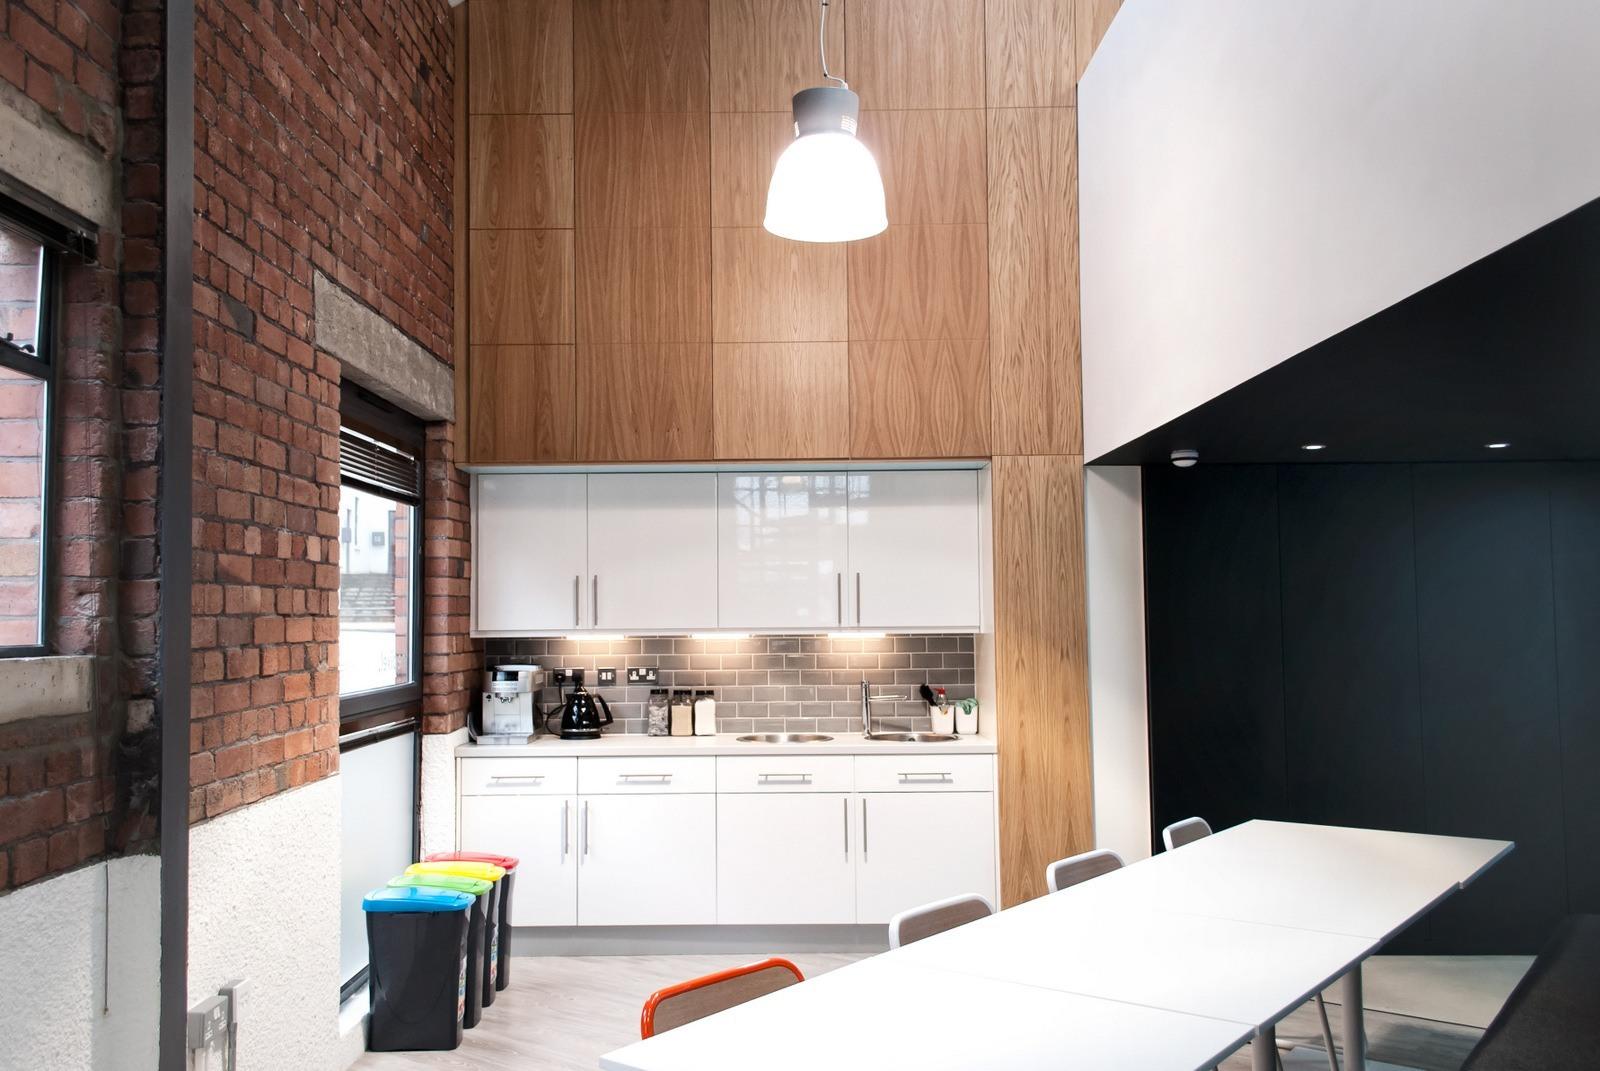 Take A Look At The Pixels Stylish Bristol Office Officelovin - Kitchen designers bristol